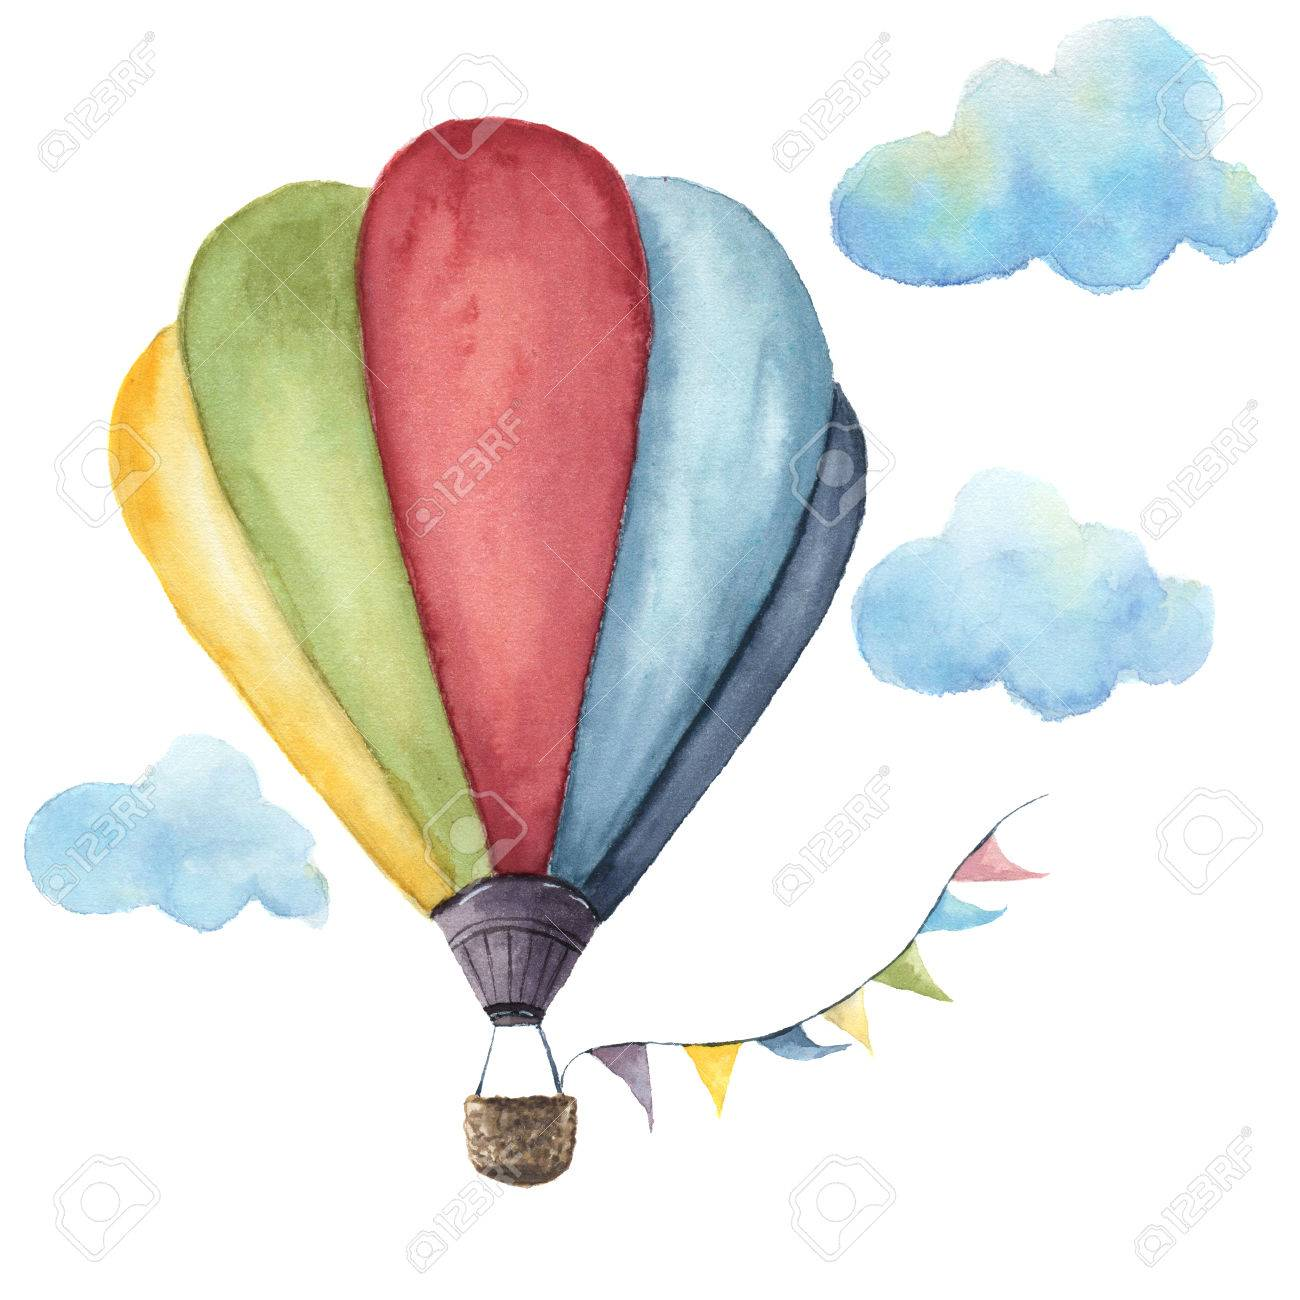 1300x1300 Drawn Hot Air Balloon Watercolor